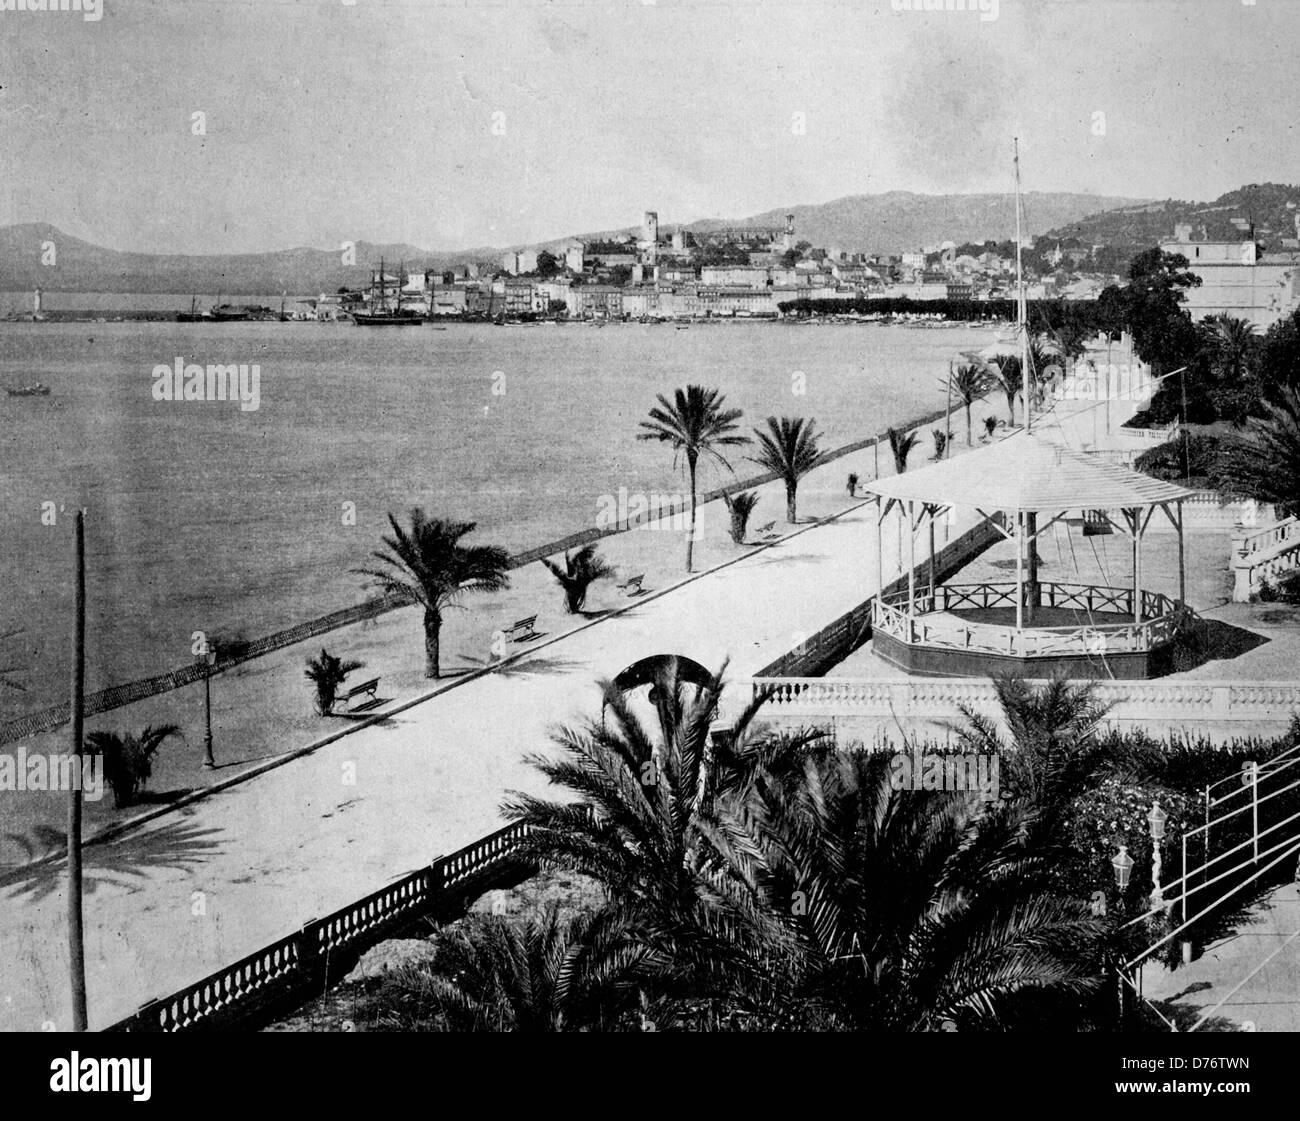 Early autotype Cannes, Côte d'Azur, France, 1880 - Stock Image